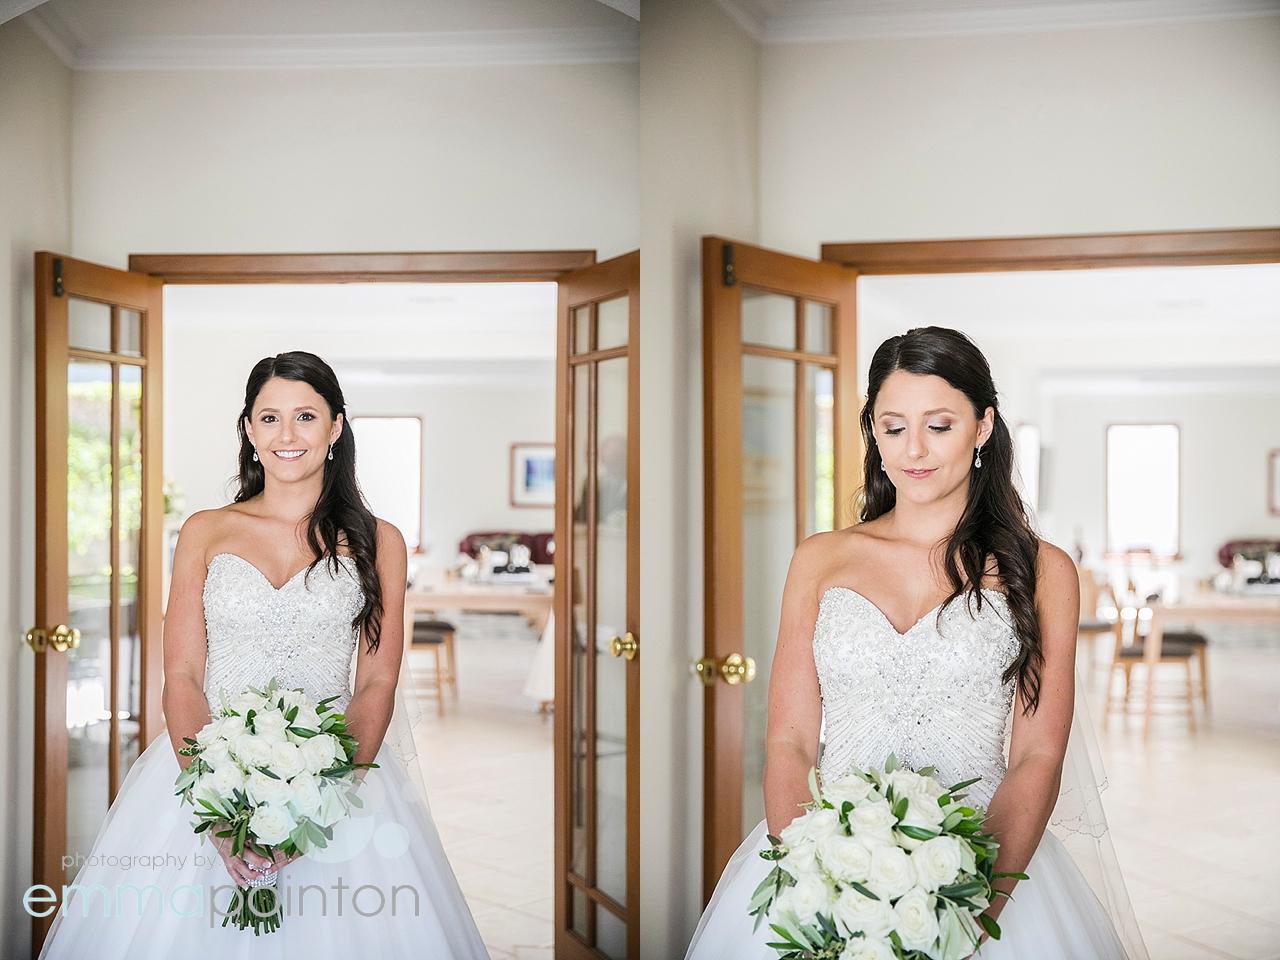 Bathers Beach House Wedding 026.jpg